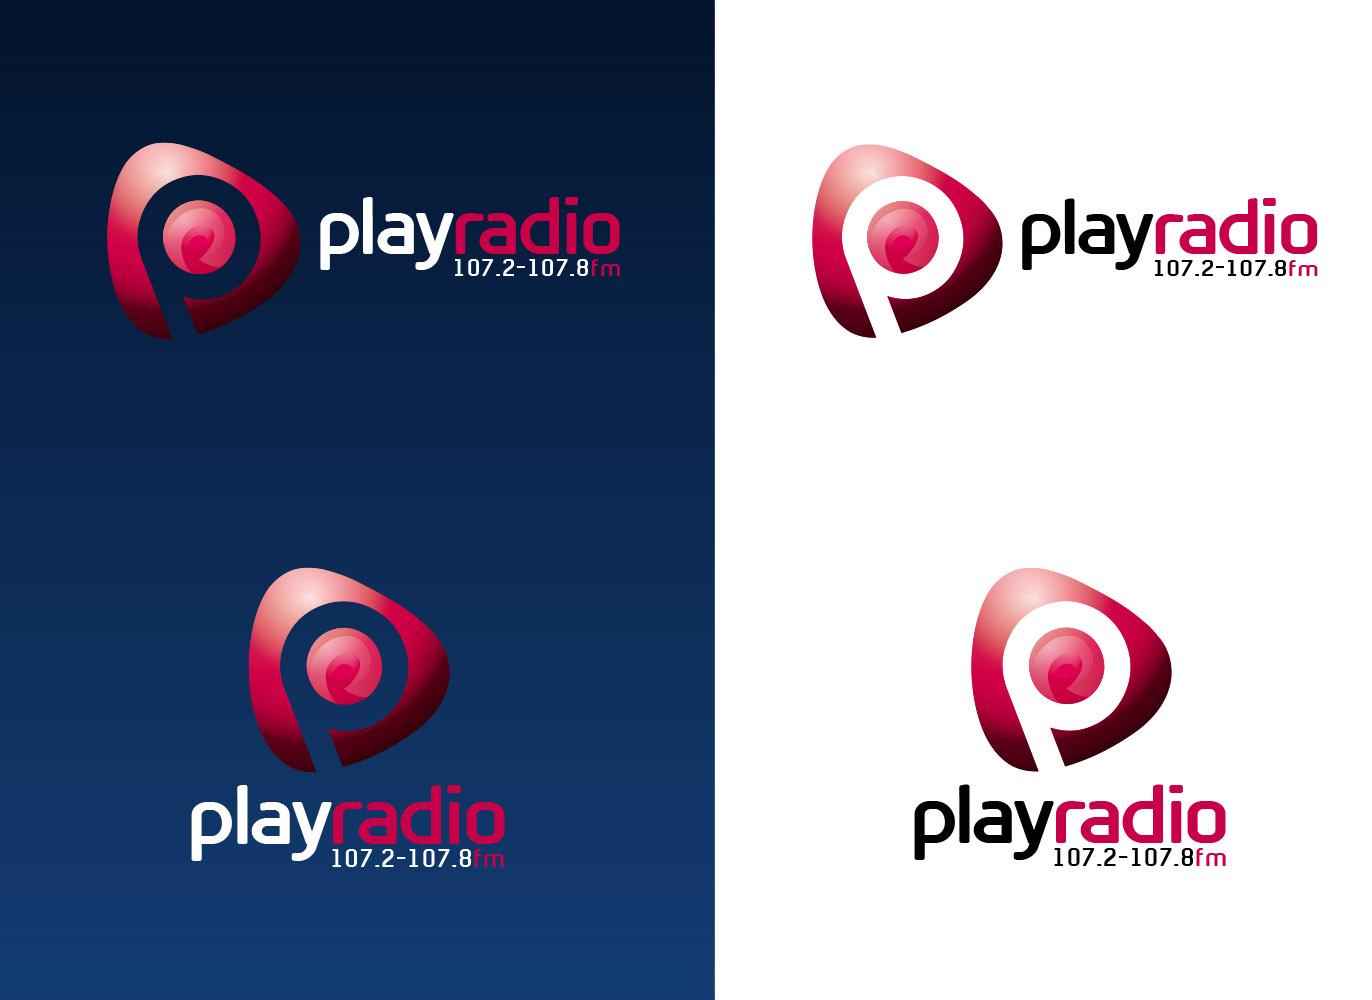 Radio Logo Play radio logo design